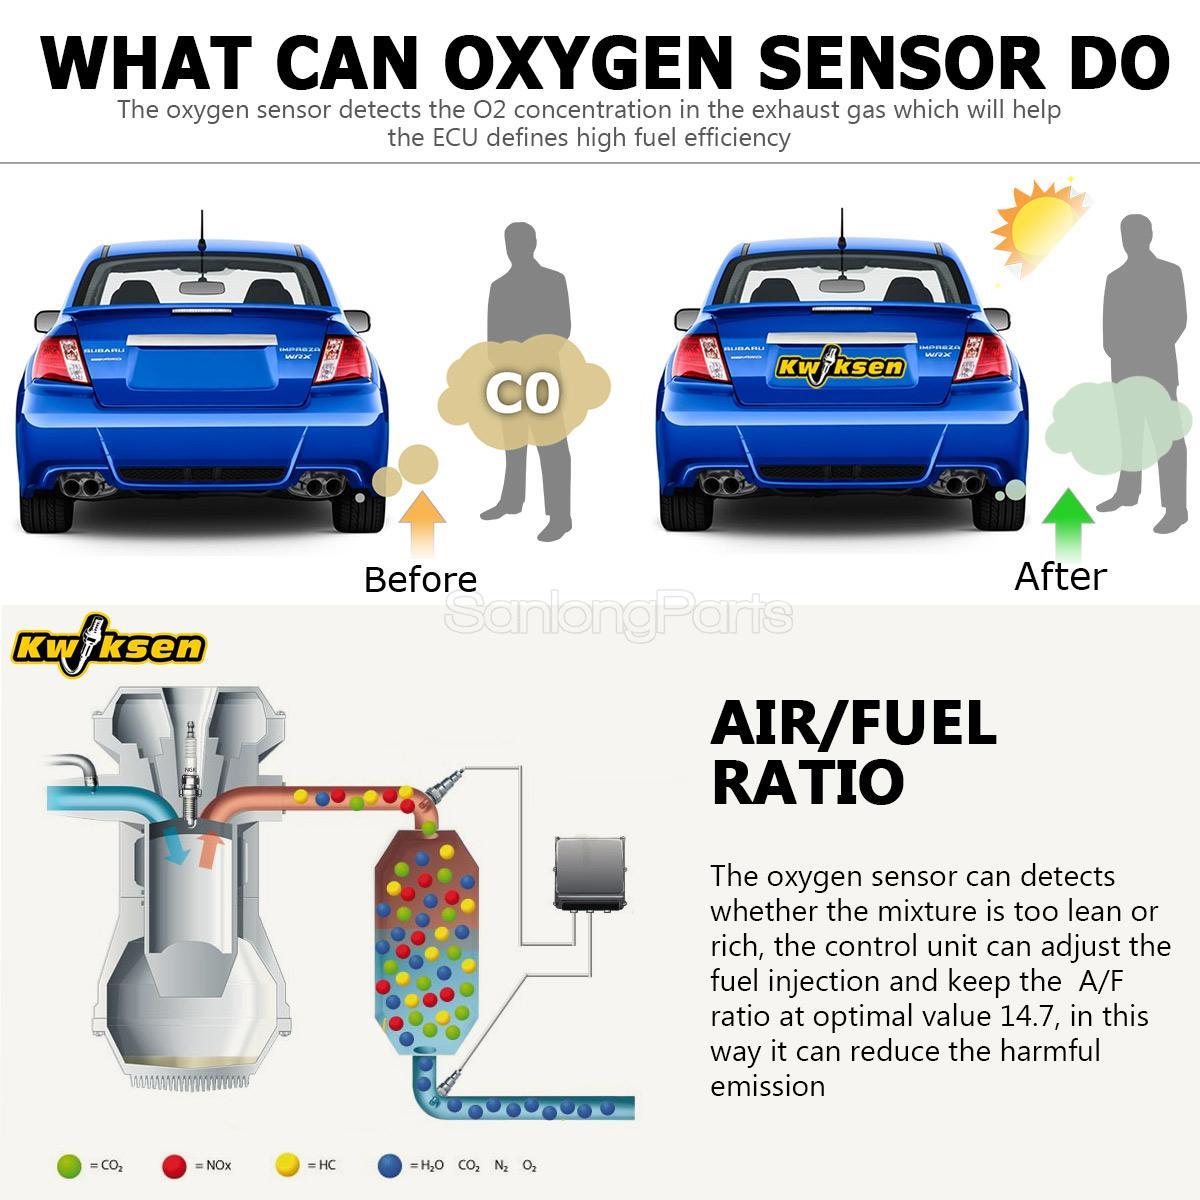 CAROCK Oxygen Sensor Replacement for DY1183 DY1185 SG1996 2345113 234-5113 Upstream Oxygen Sensor Compatible with Ford Escape Fiesta Flex Focus Fusion O2 Sensor